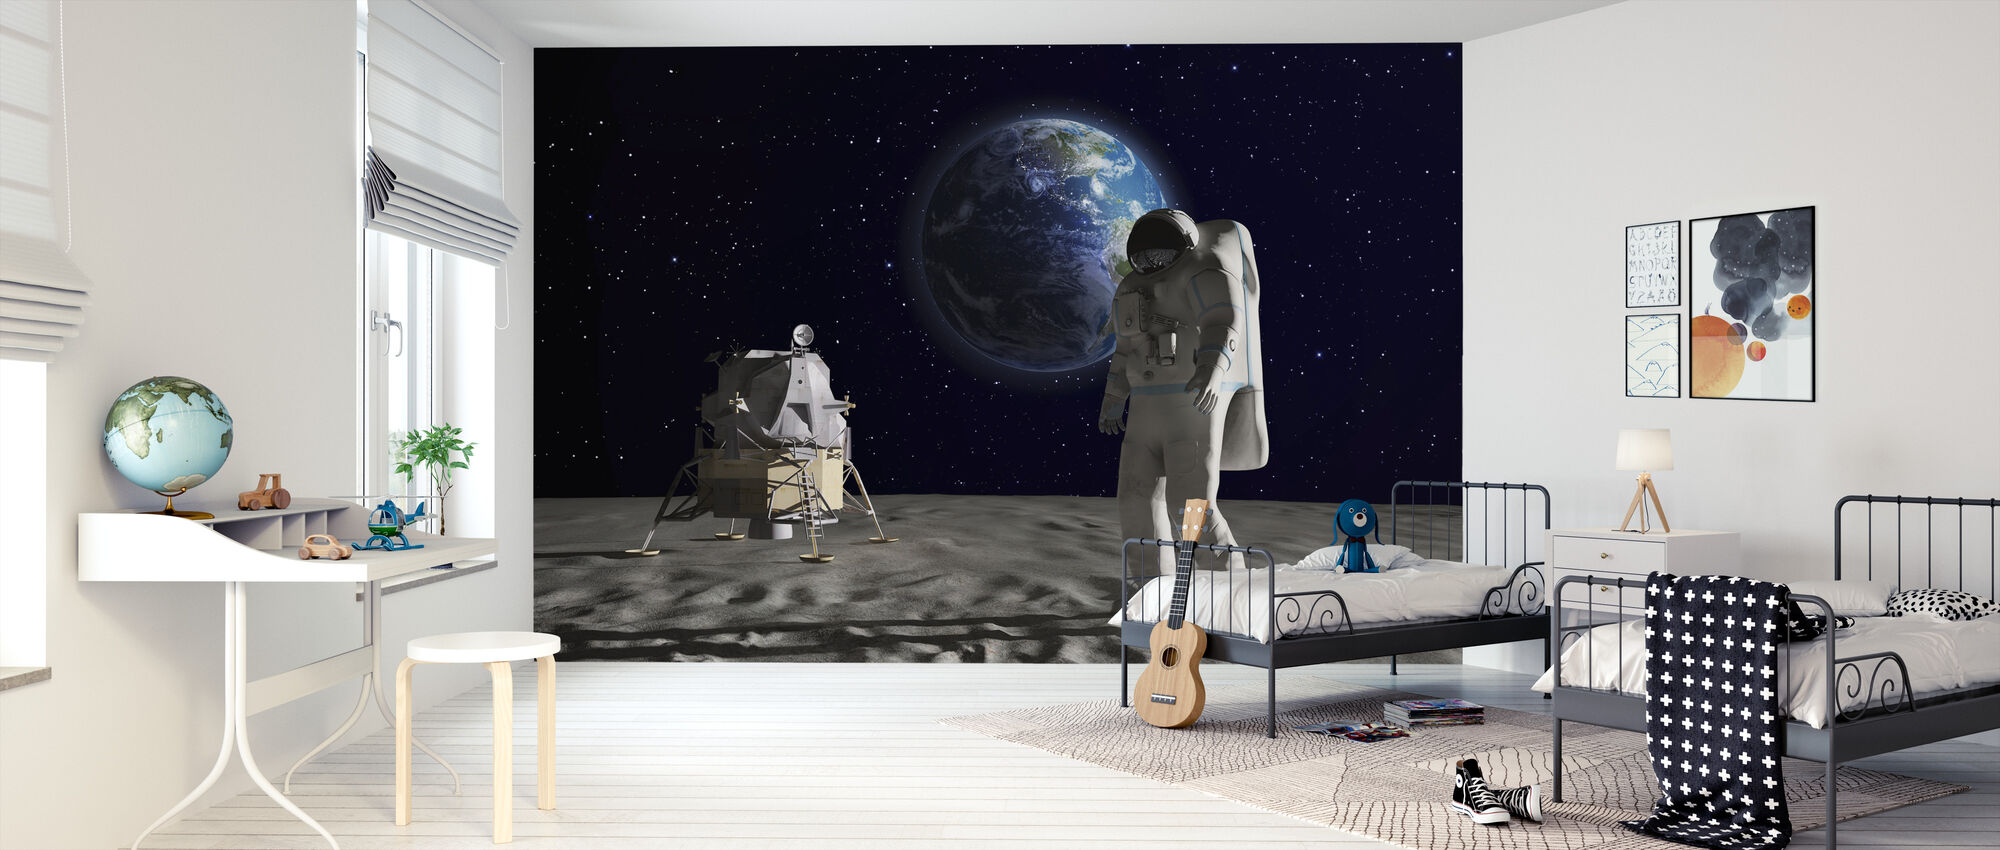 Astronaut on the Moon 2 - Wallpaper - Kids Room